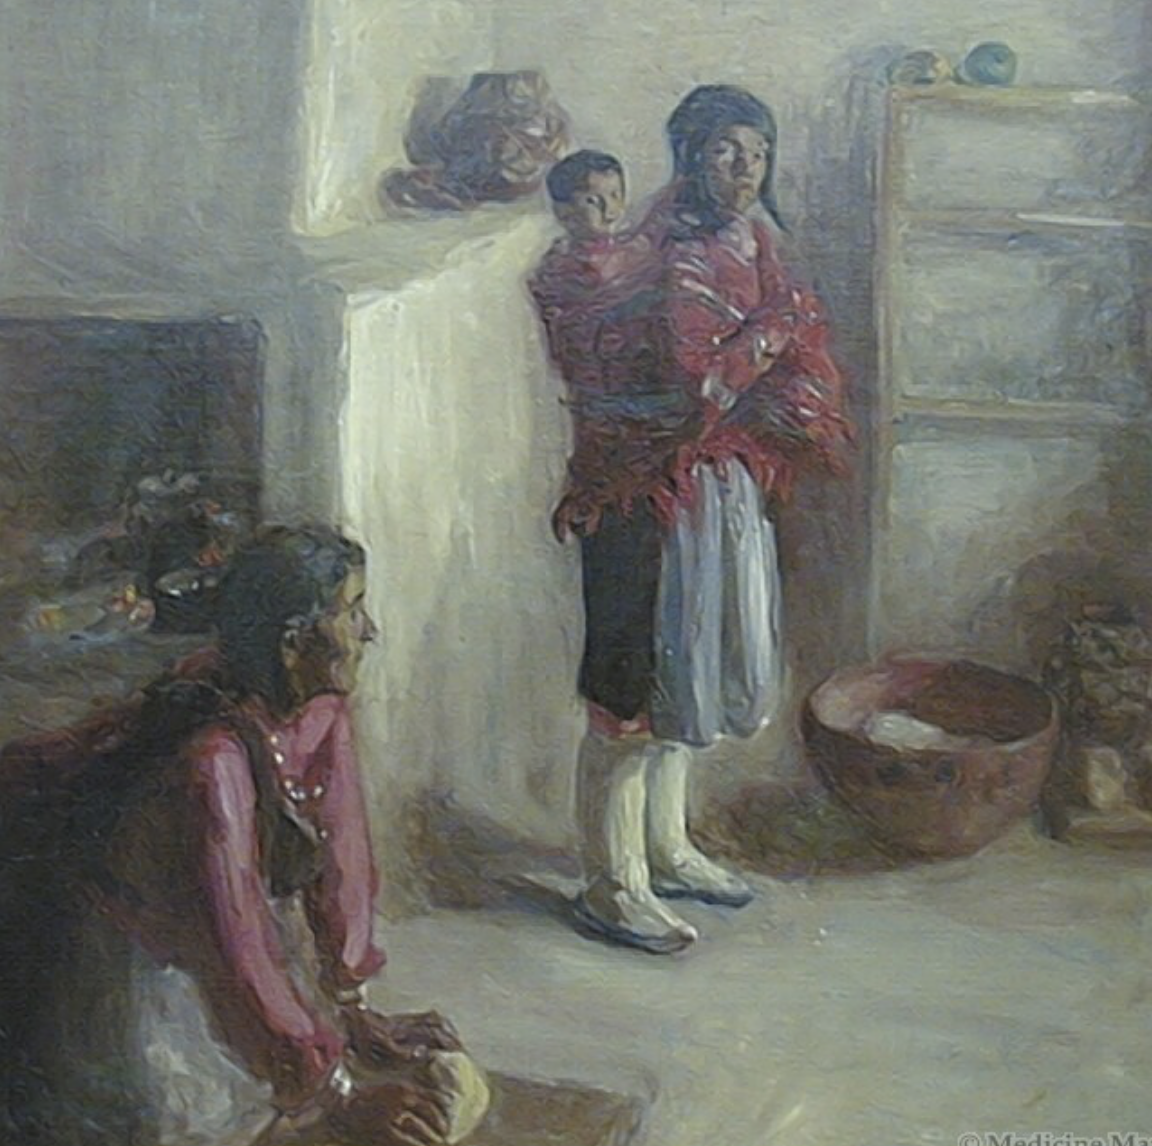 Cleaver, Alice 1878-1944